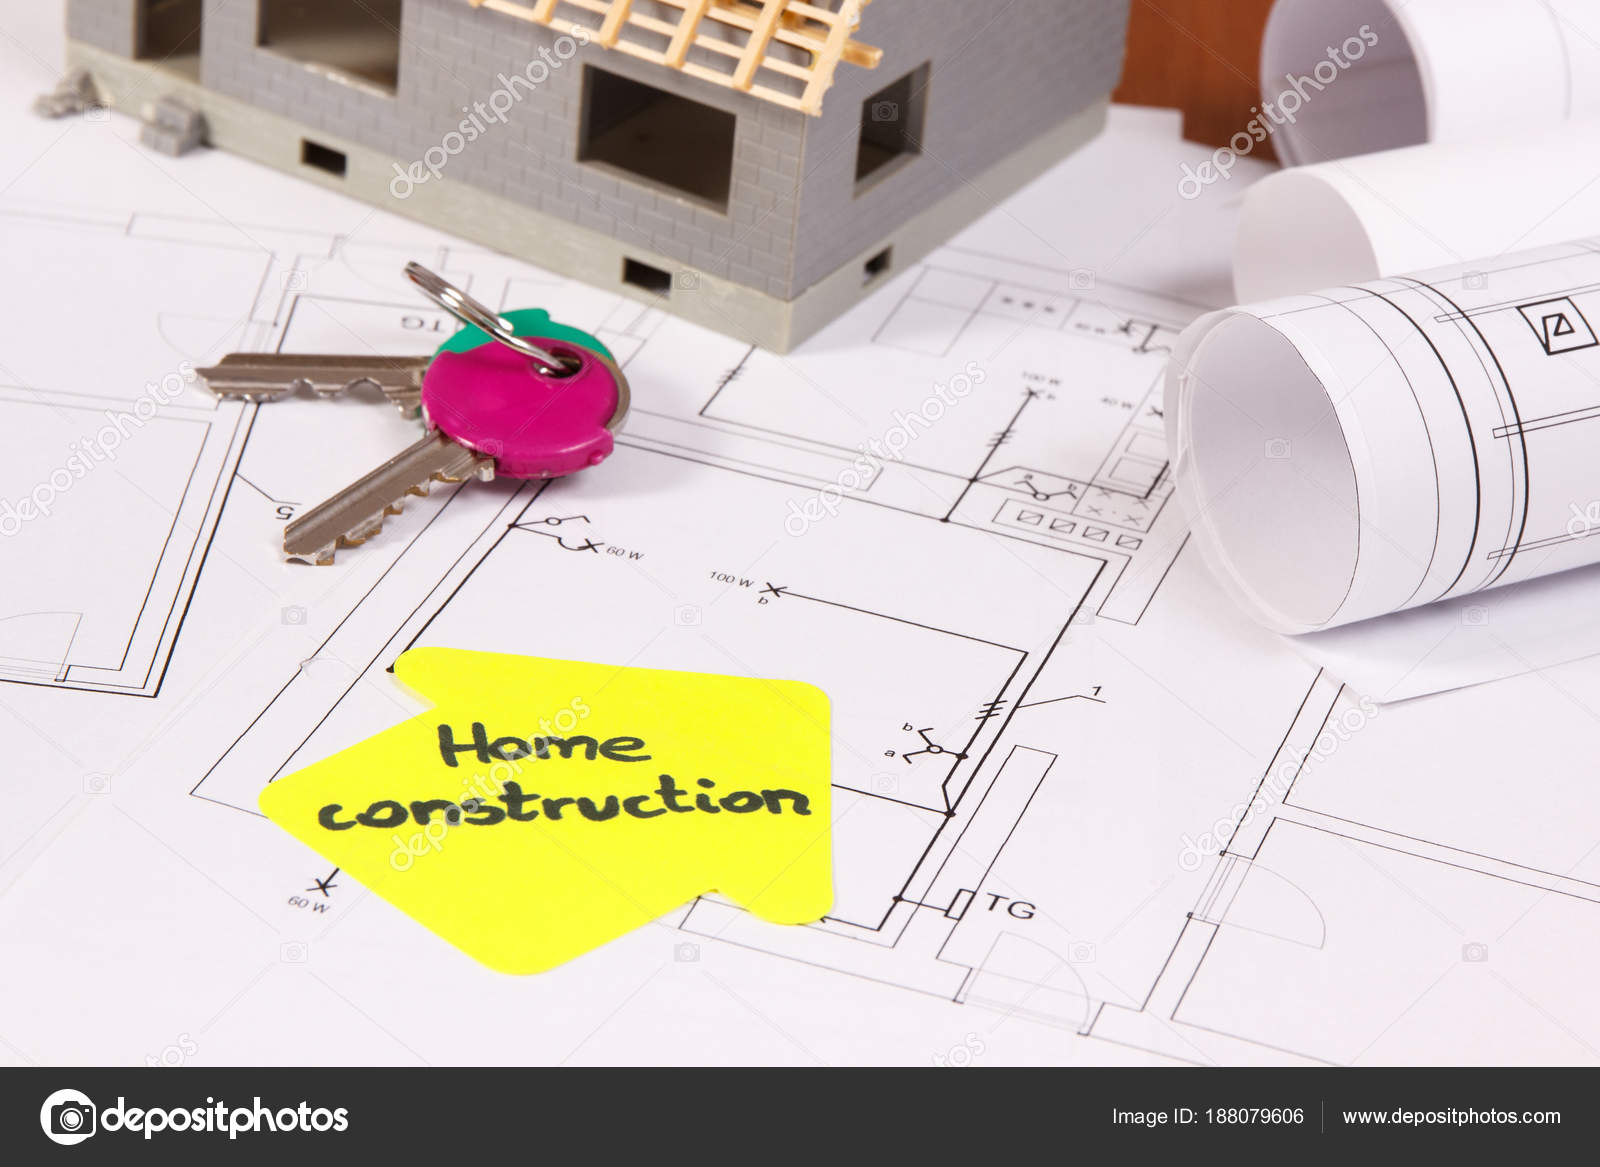 Schemi Elettrici Per Casa : Chiavi di casa casa in costruzione e schemi elettrici per lavori